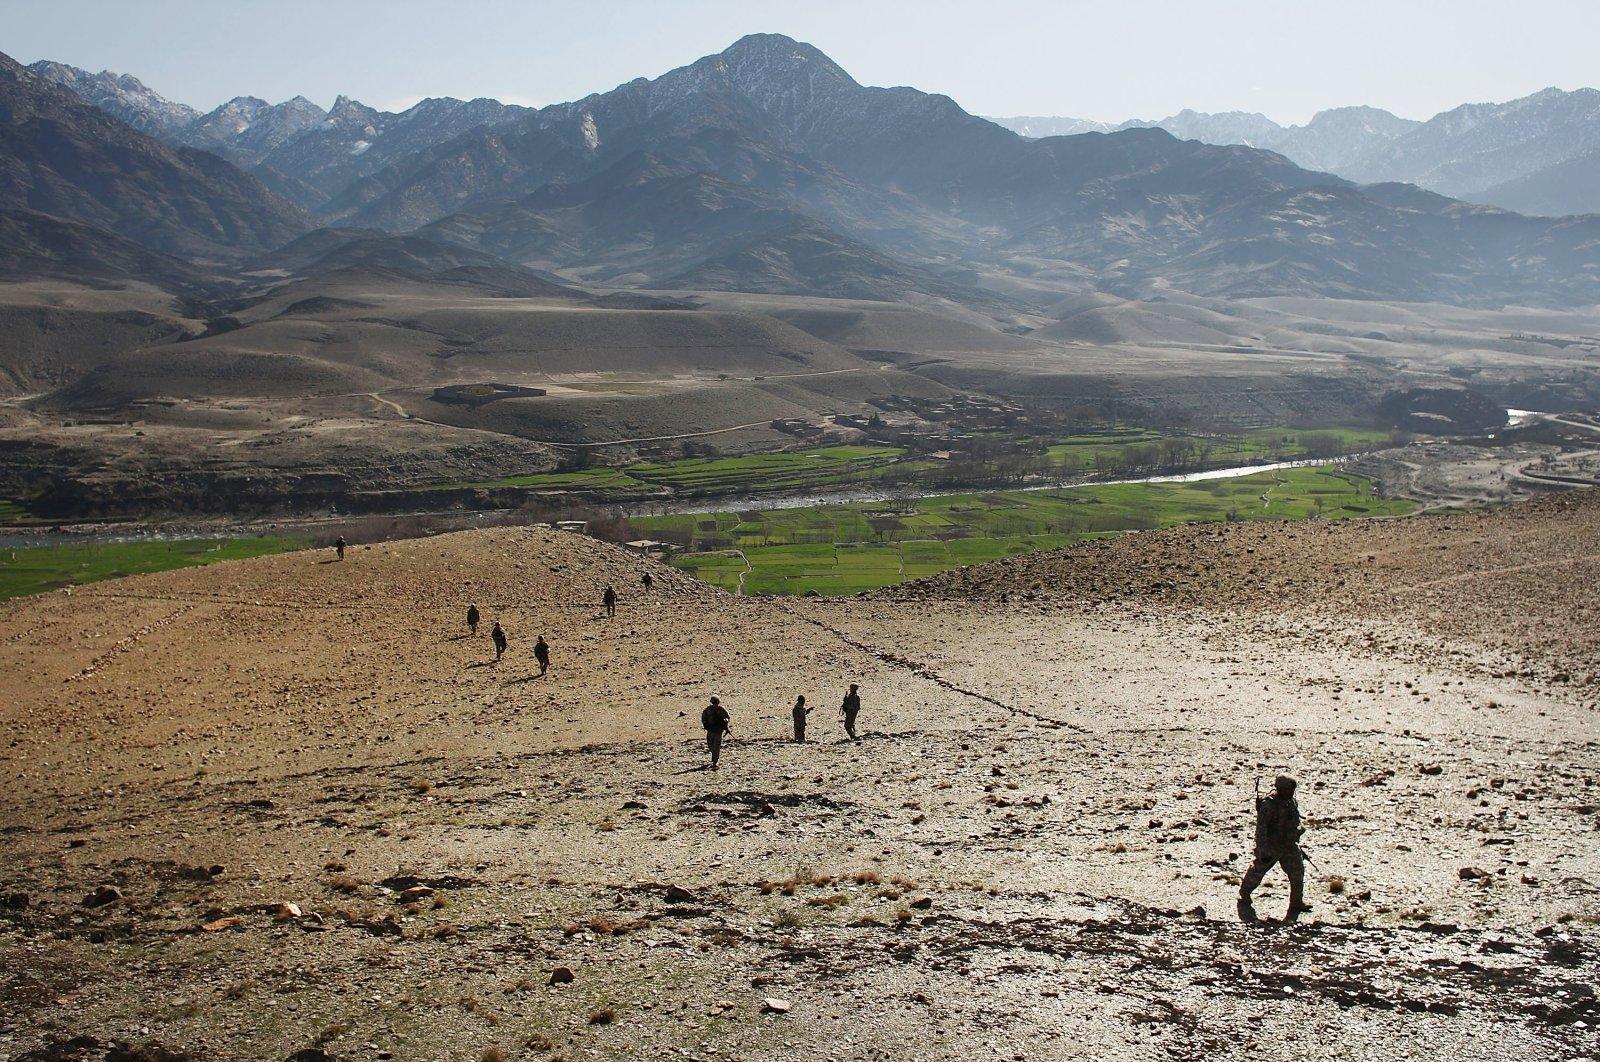 U.S. soldiers patrol areas near the village of Baba Kala, Nuristan province, eastern Afghanistan, Feb. 17, 2009. (Getty Images)